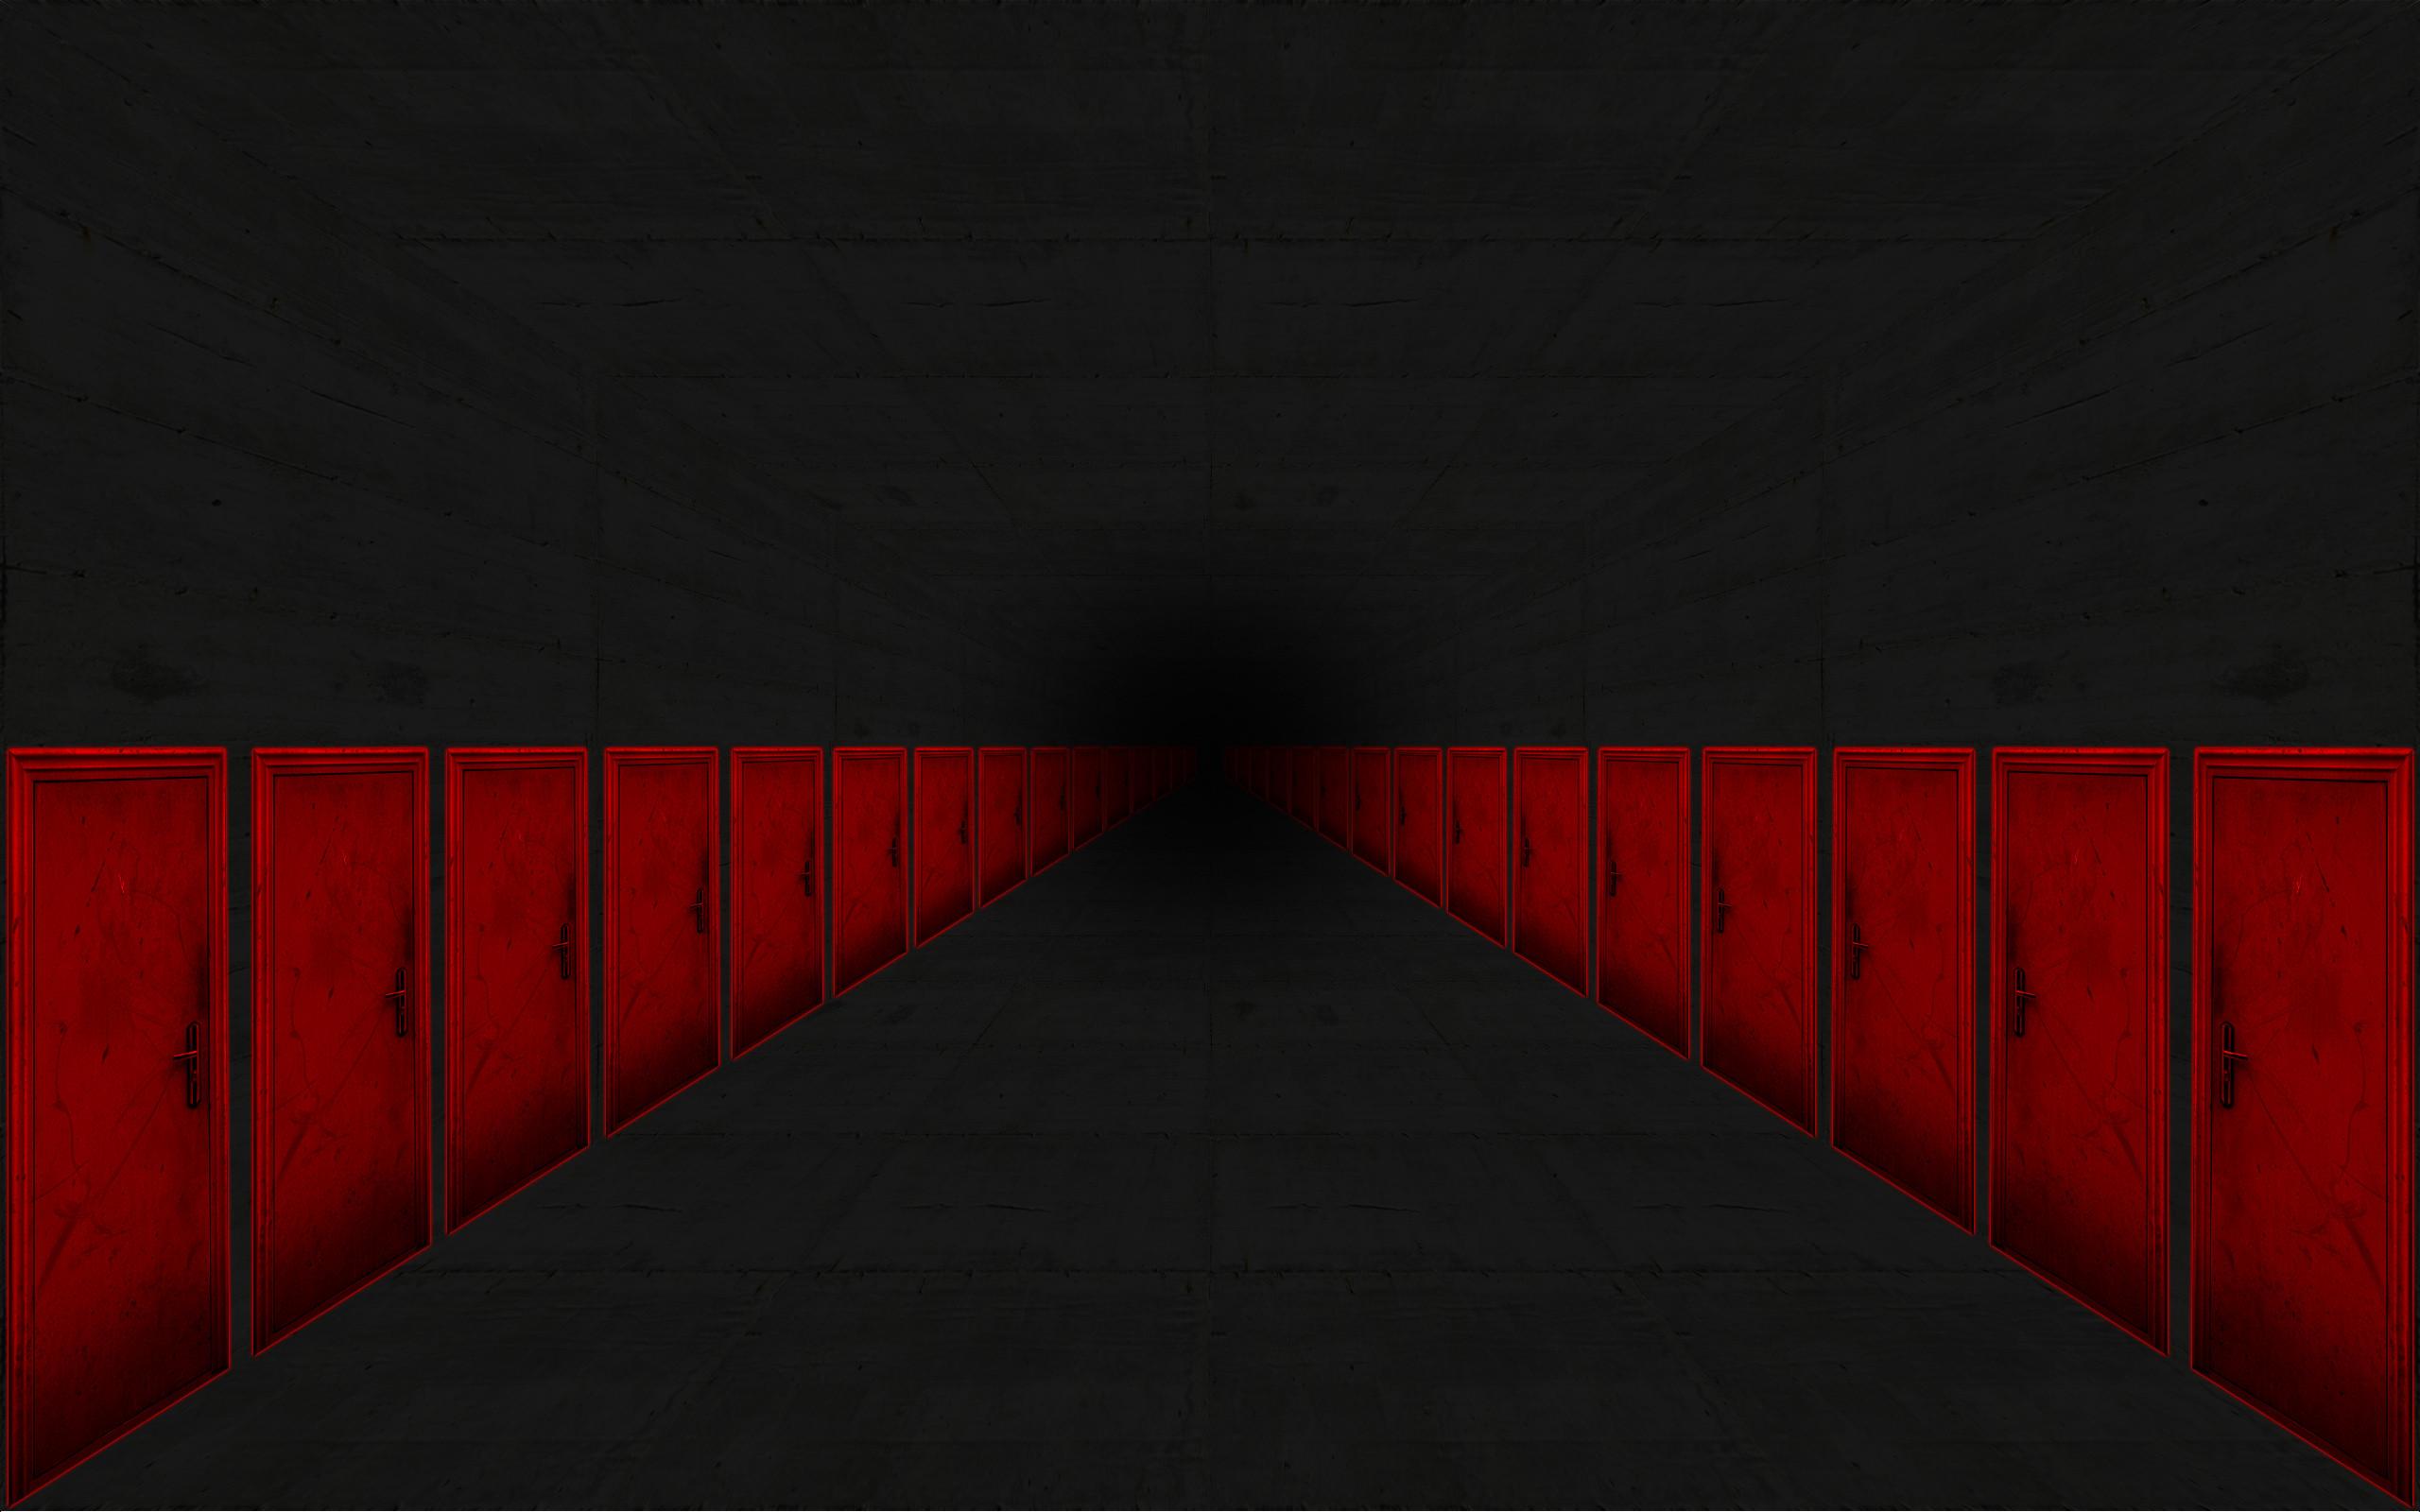 Red-black-wallpaper-hd-resolution